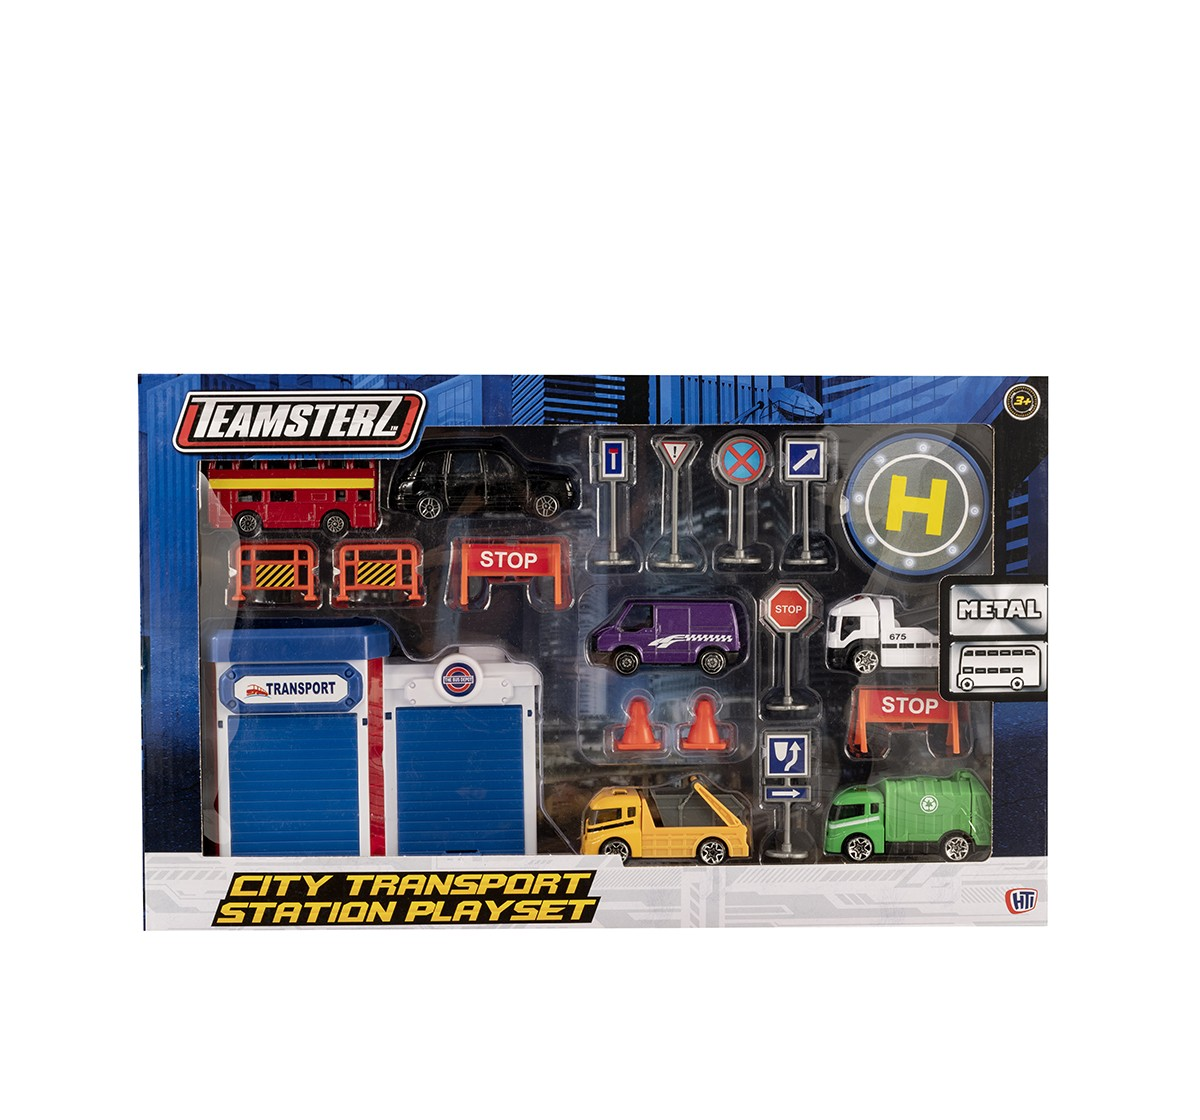 "Teamsterz  3"" Die Casttransport Play Set Vehicles for Kids age 3Y+"